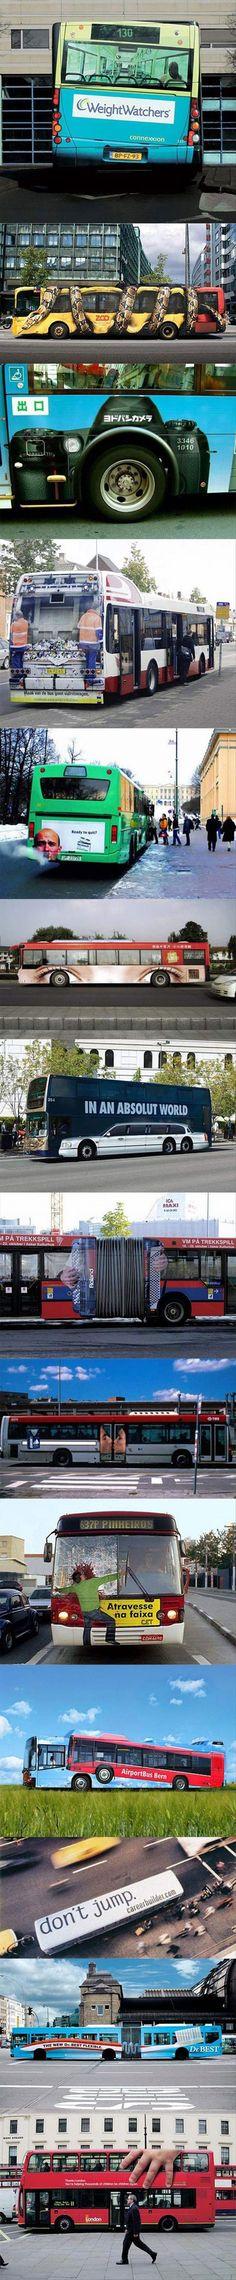 creative buses